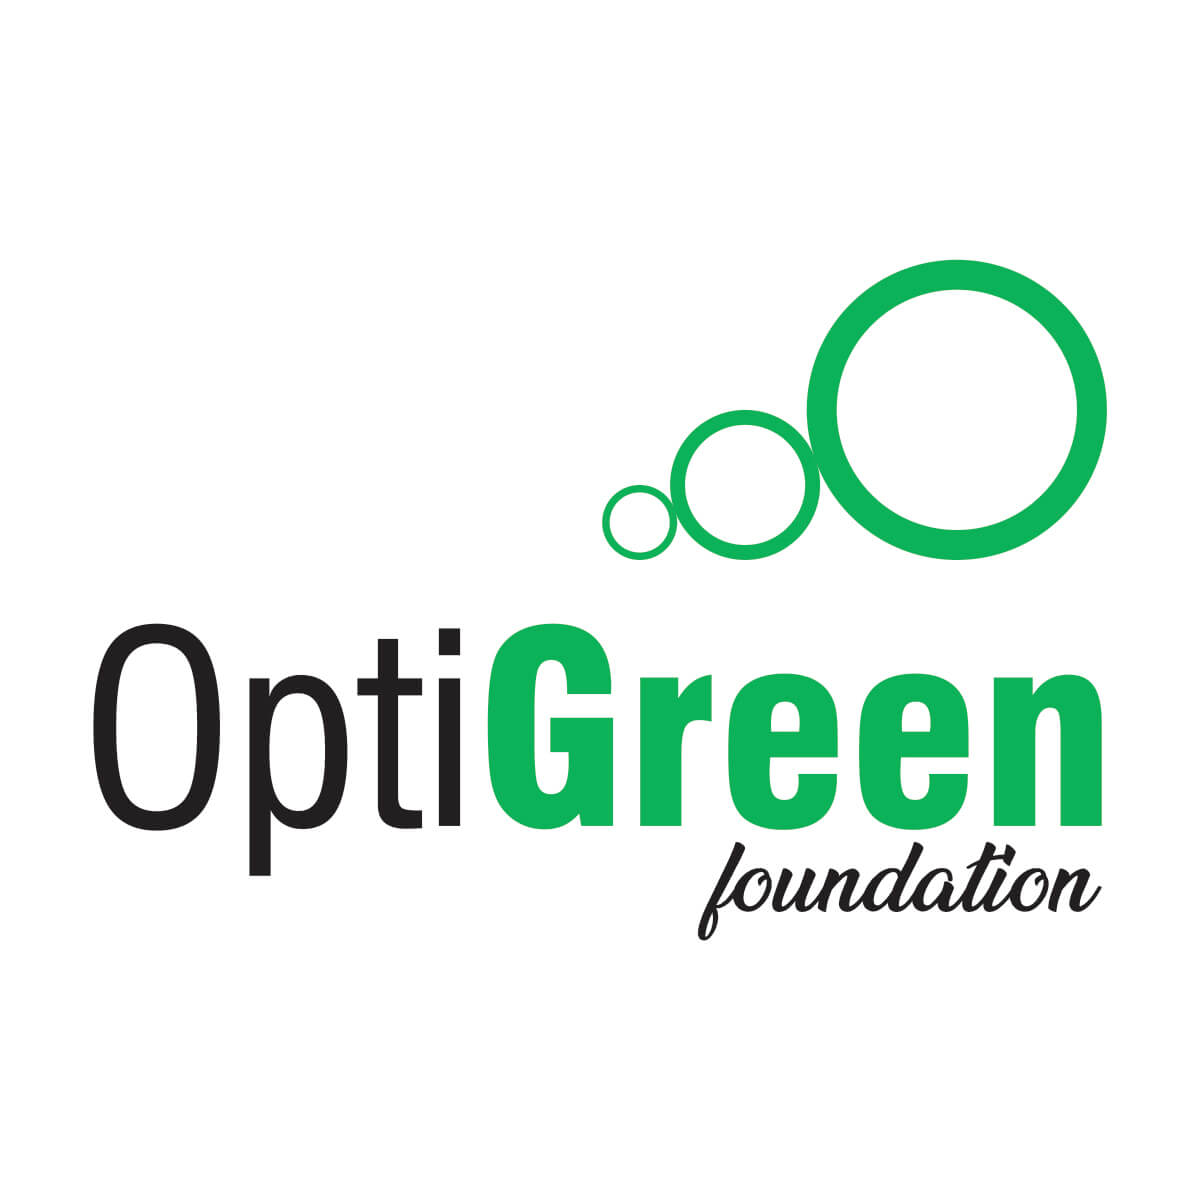 OptiGreen Foundation